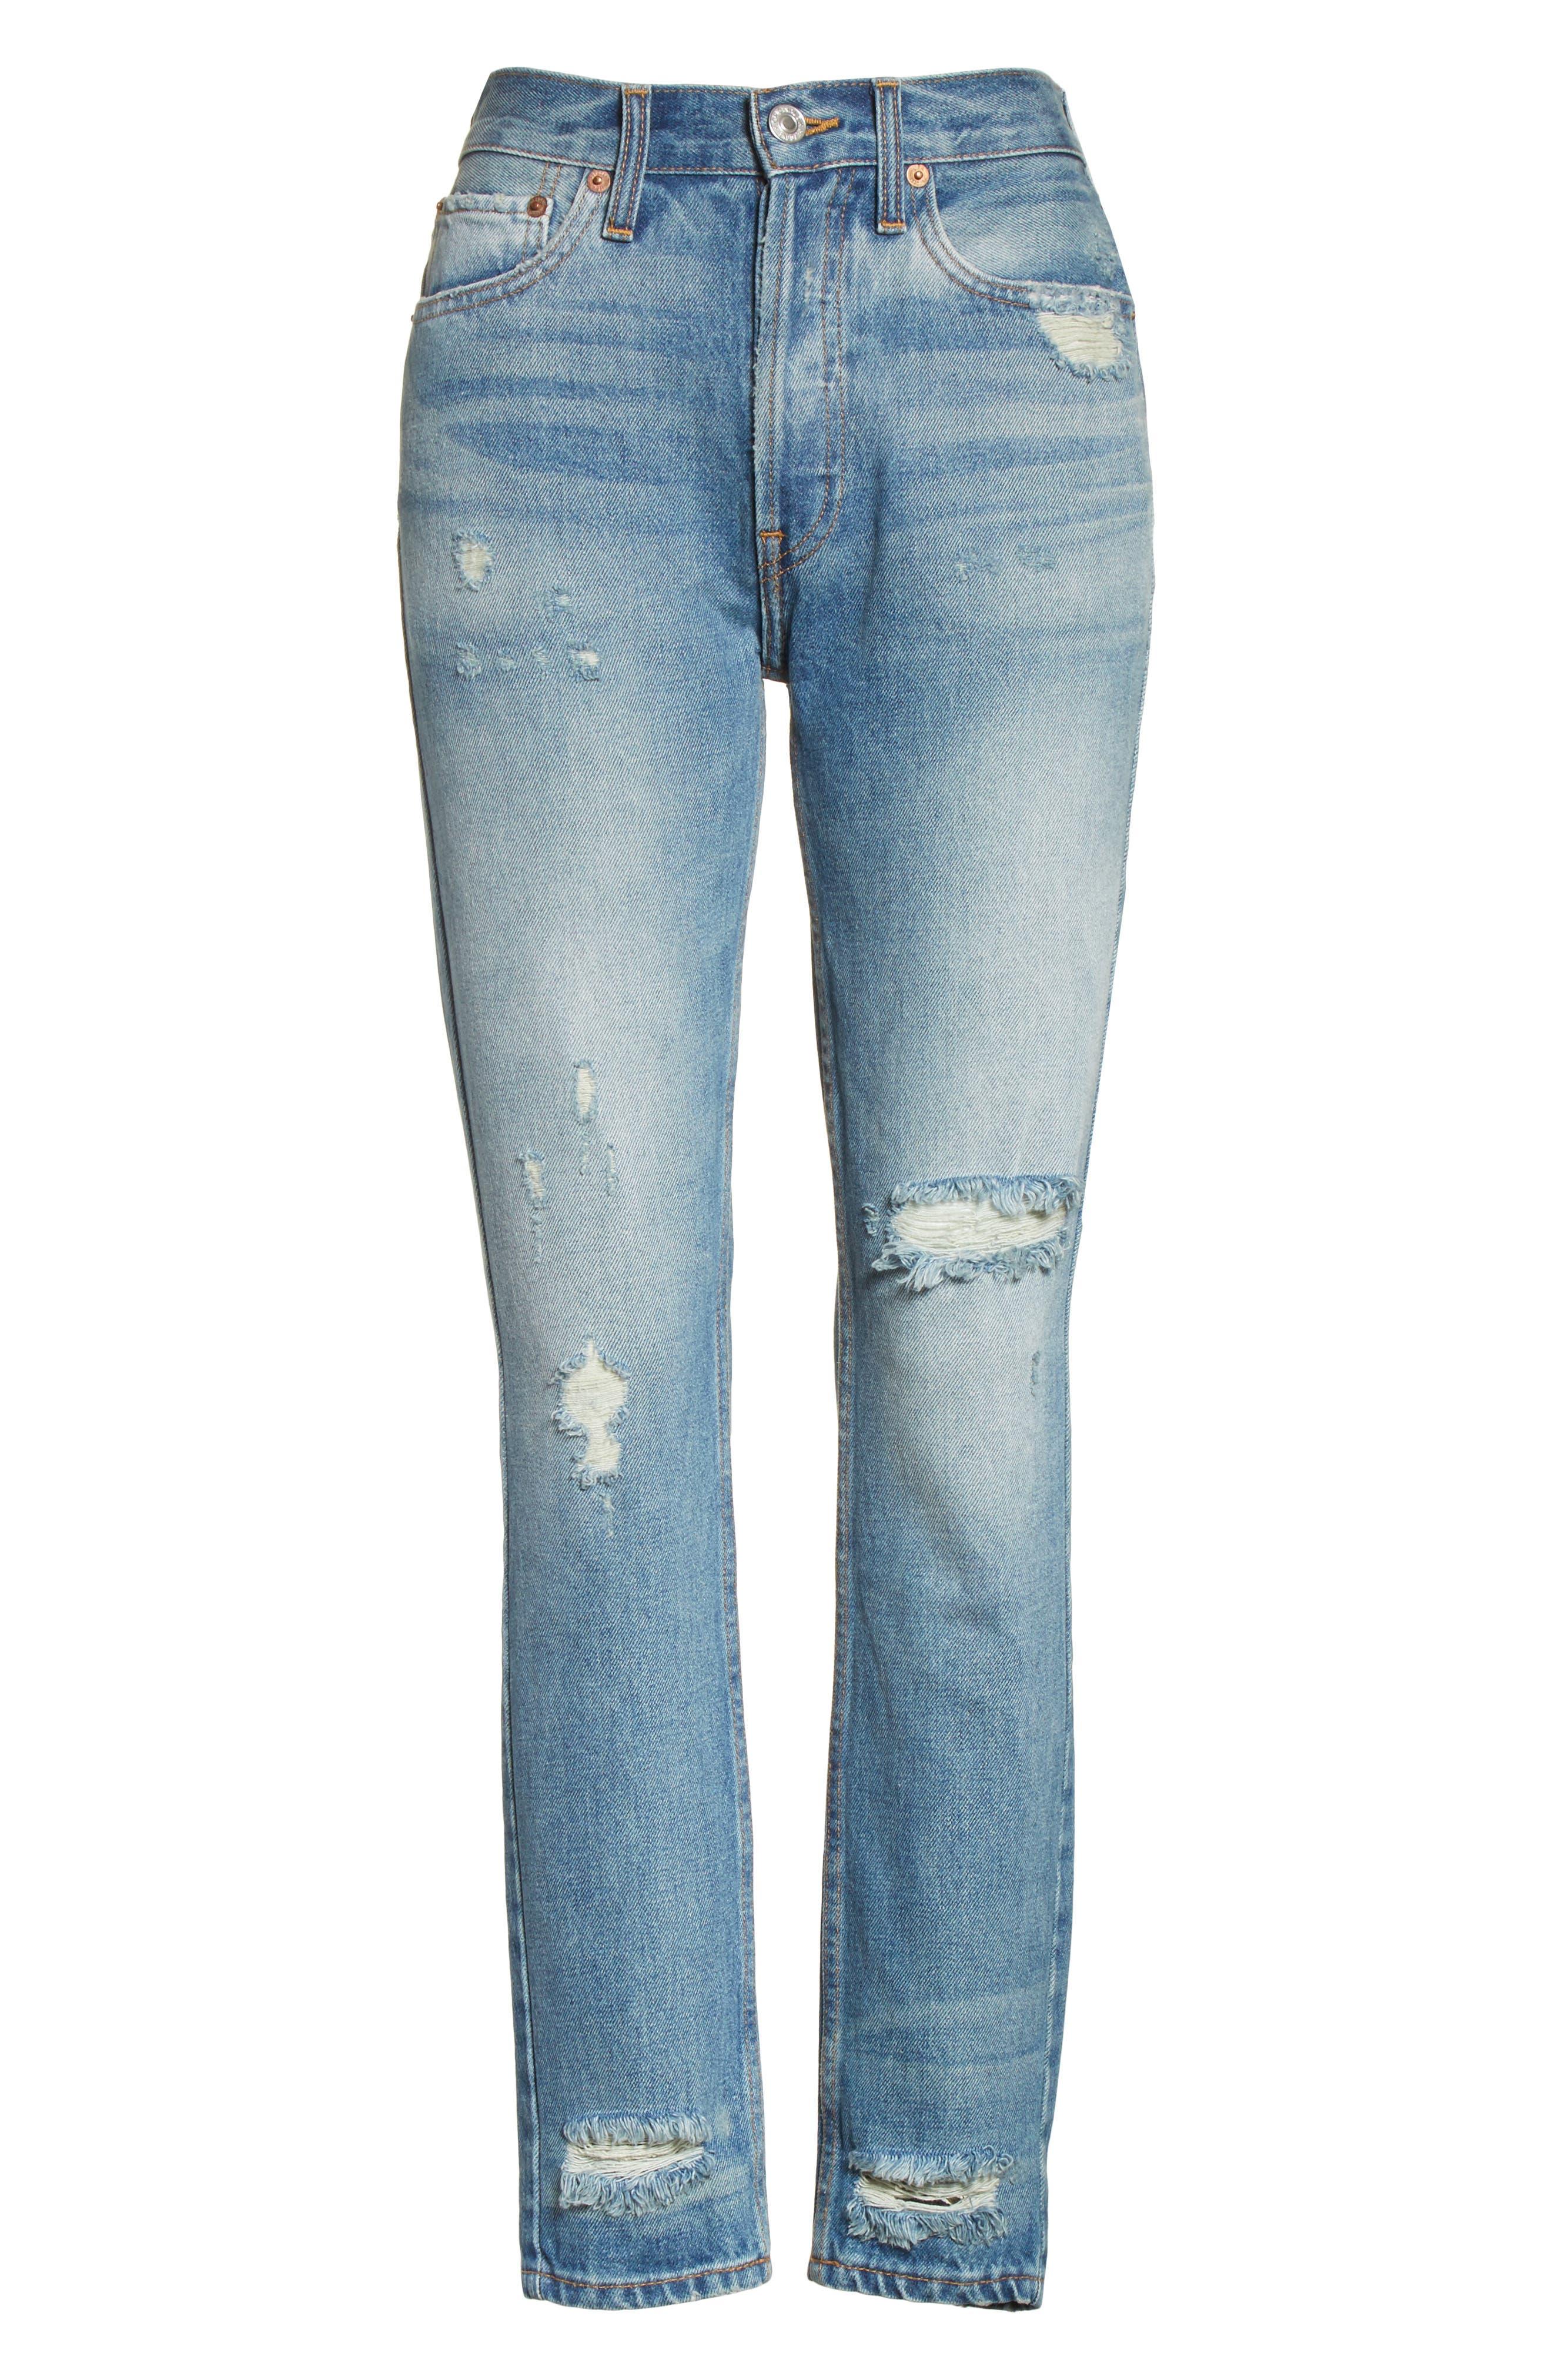 Originals High Waist Jeans,                             Alternate thumbnail 6, color,                             401